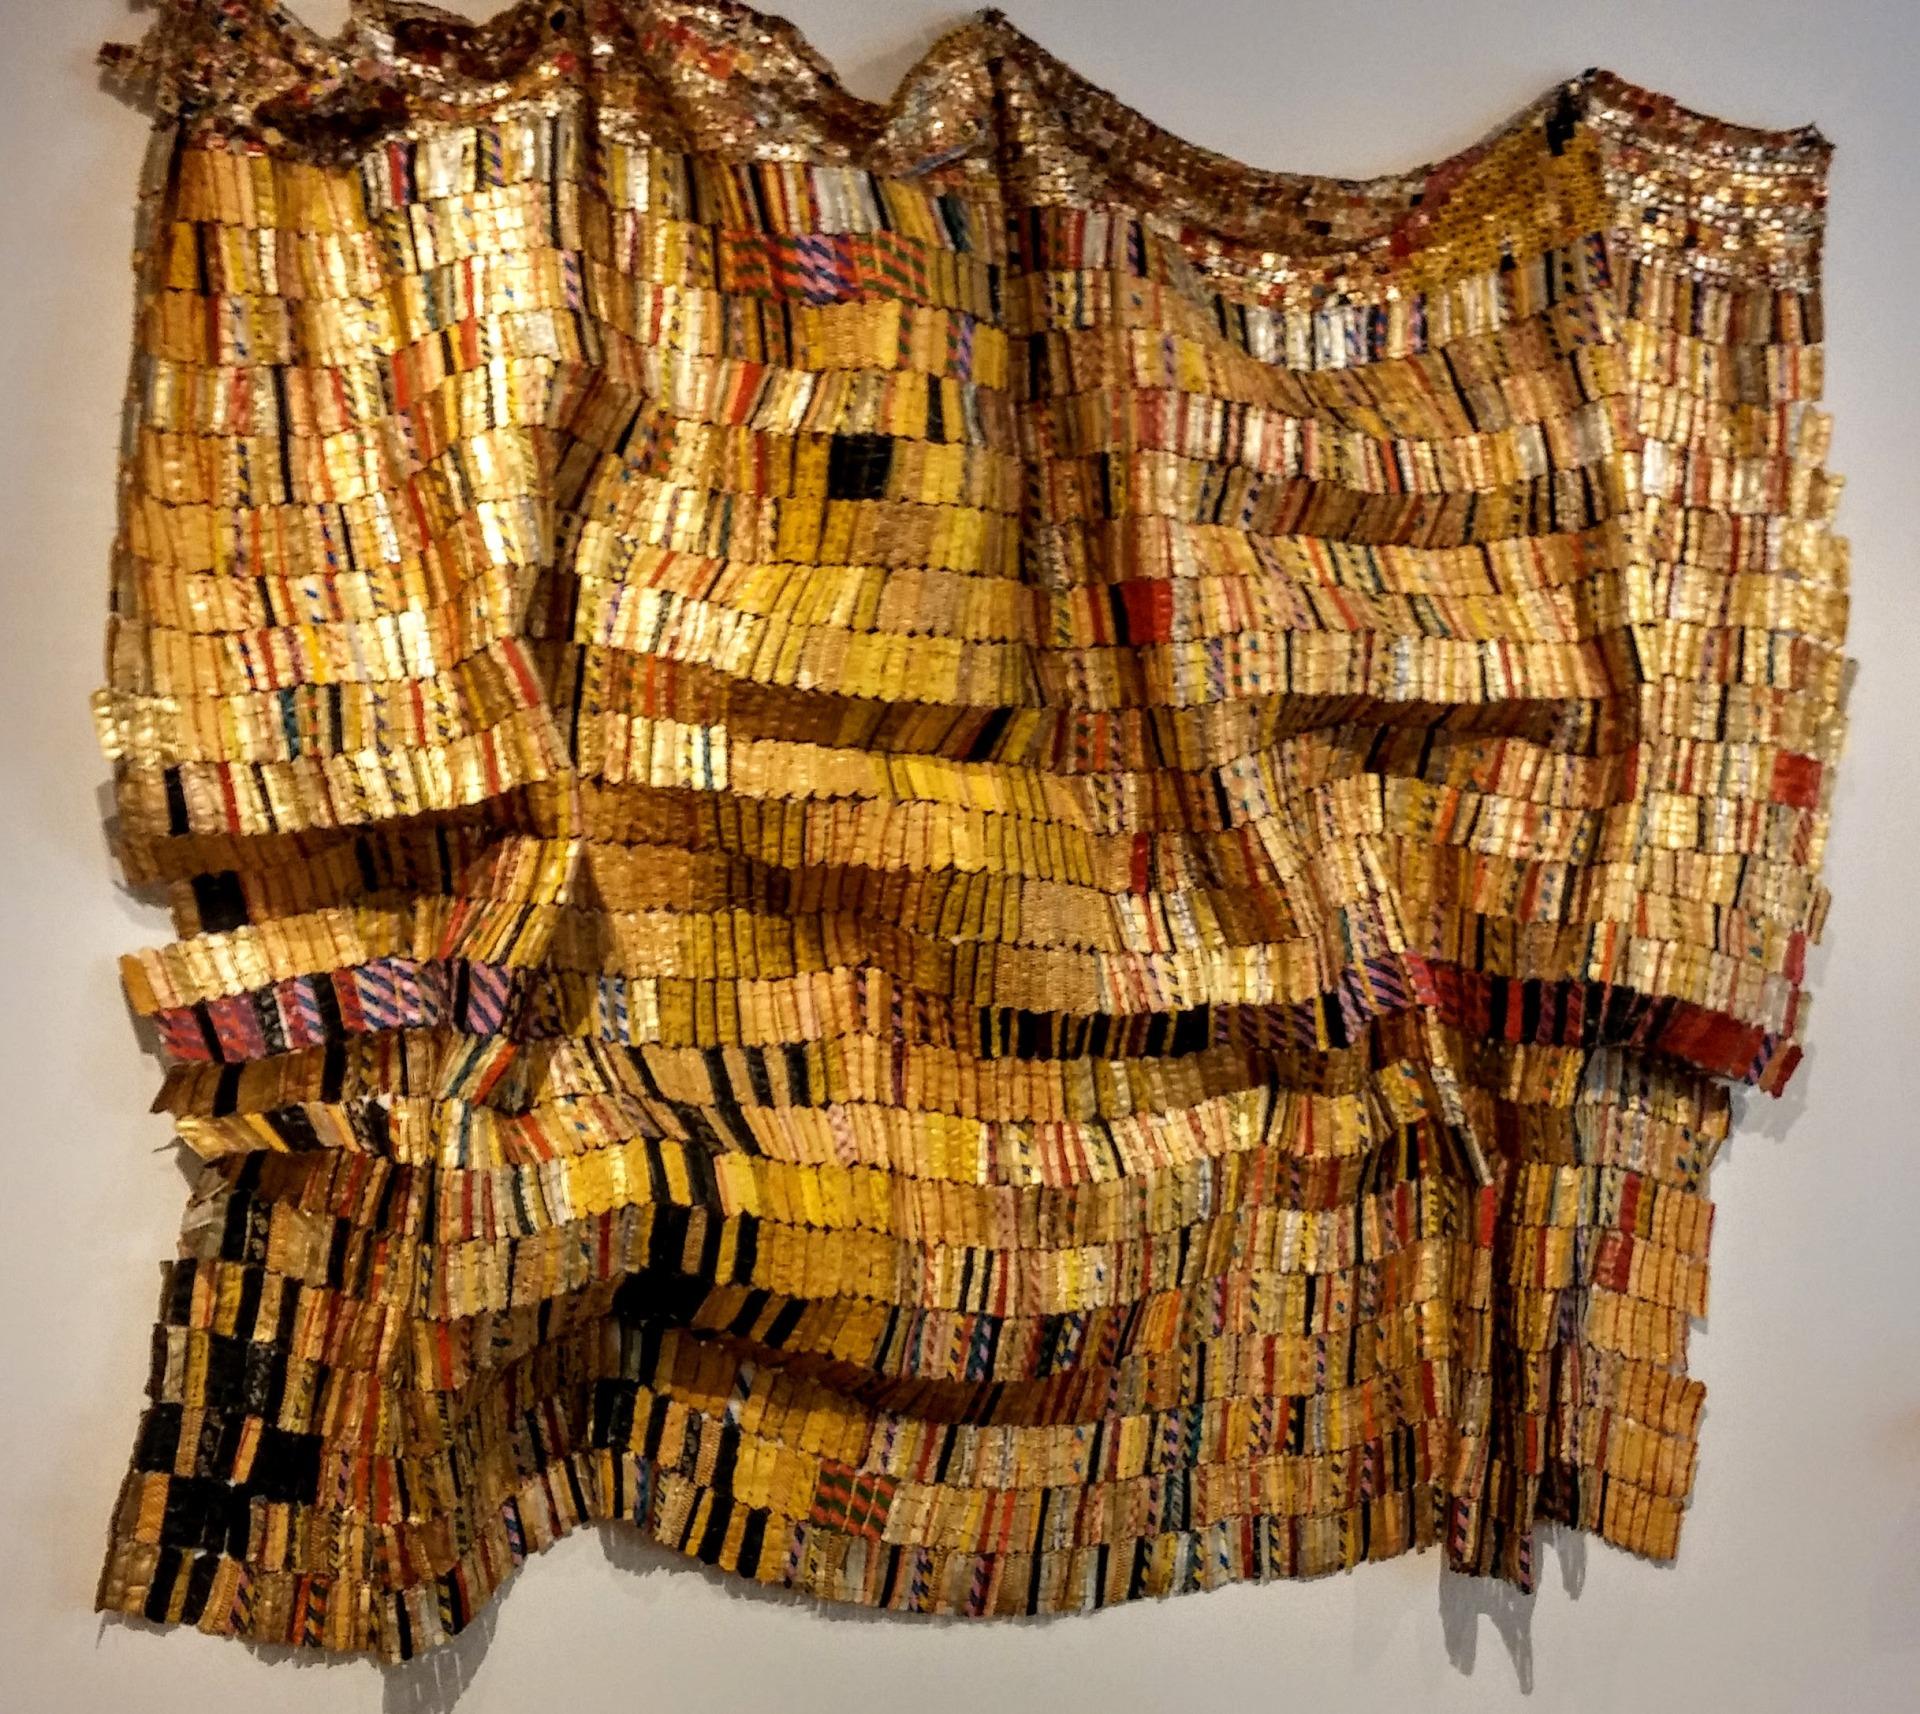 Nigerian born artist, El Anatsui, metal cloth, copyright EDGExpo.com/Rhonda P.Hill, High Museum of Art